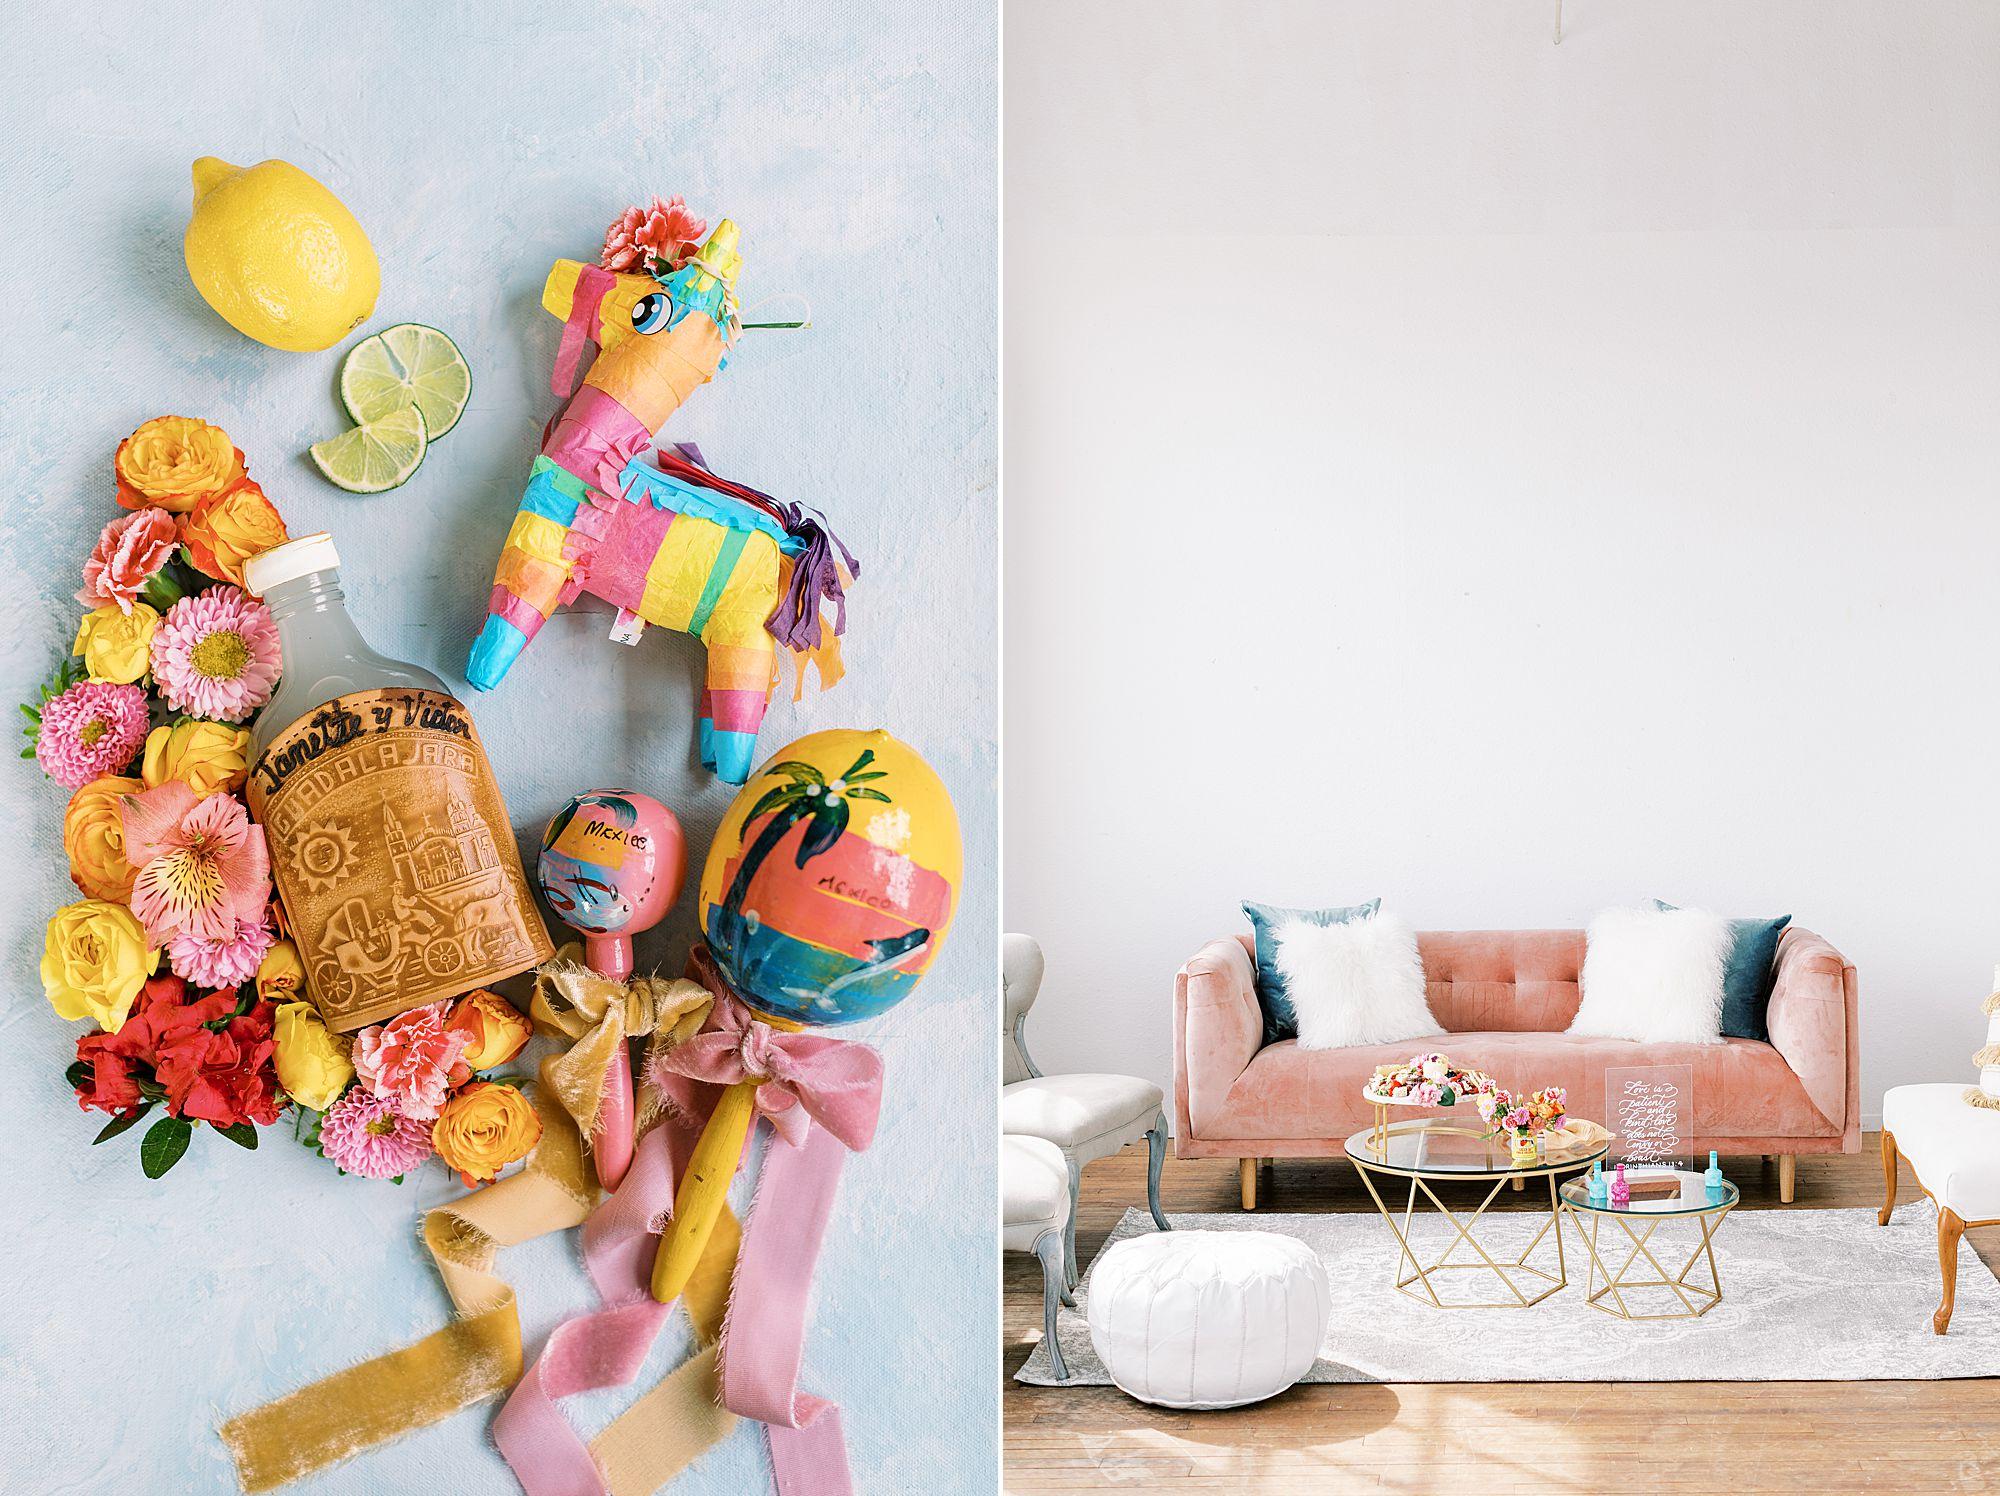 Cinco De Mayo Inspiration for Your FIesta - Party Crush Studio and Ashley Baumgartner_0032.jpg